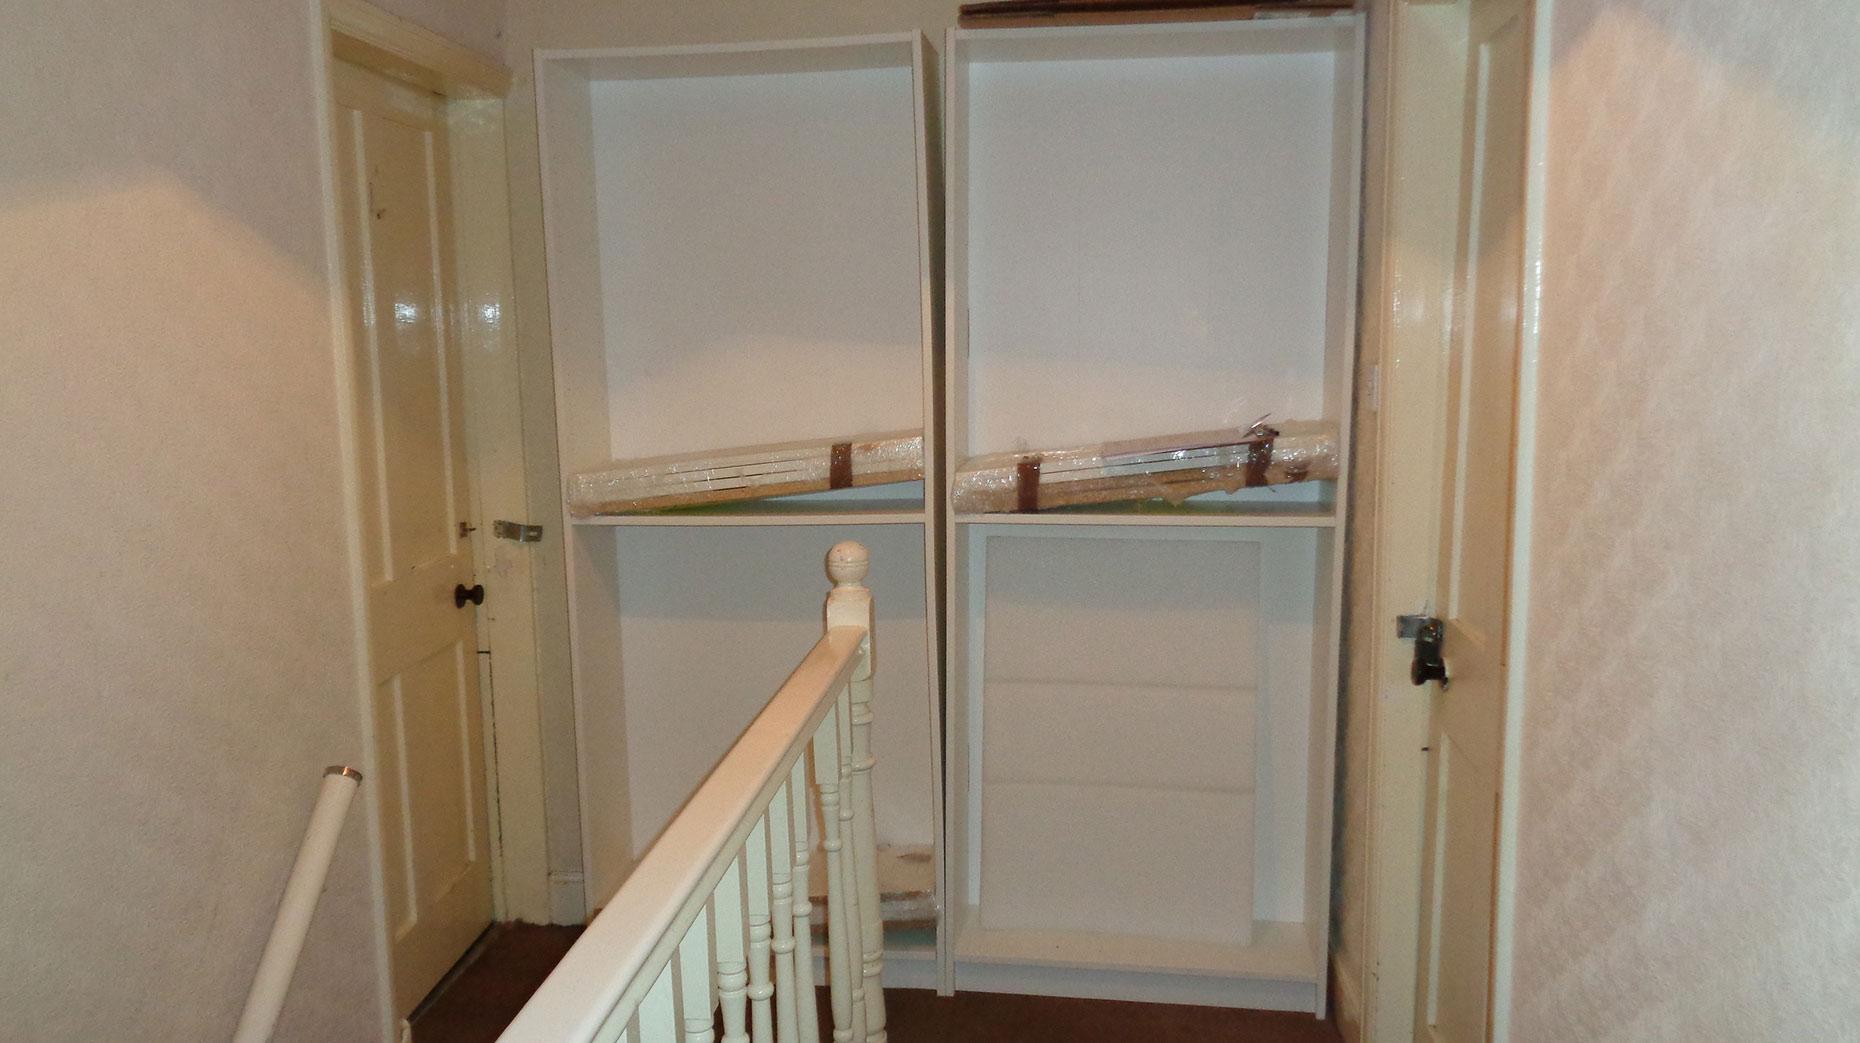 Furniture was blocking doorways in the house.